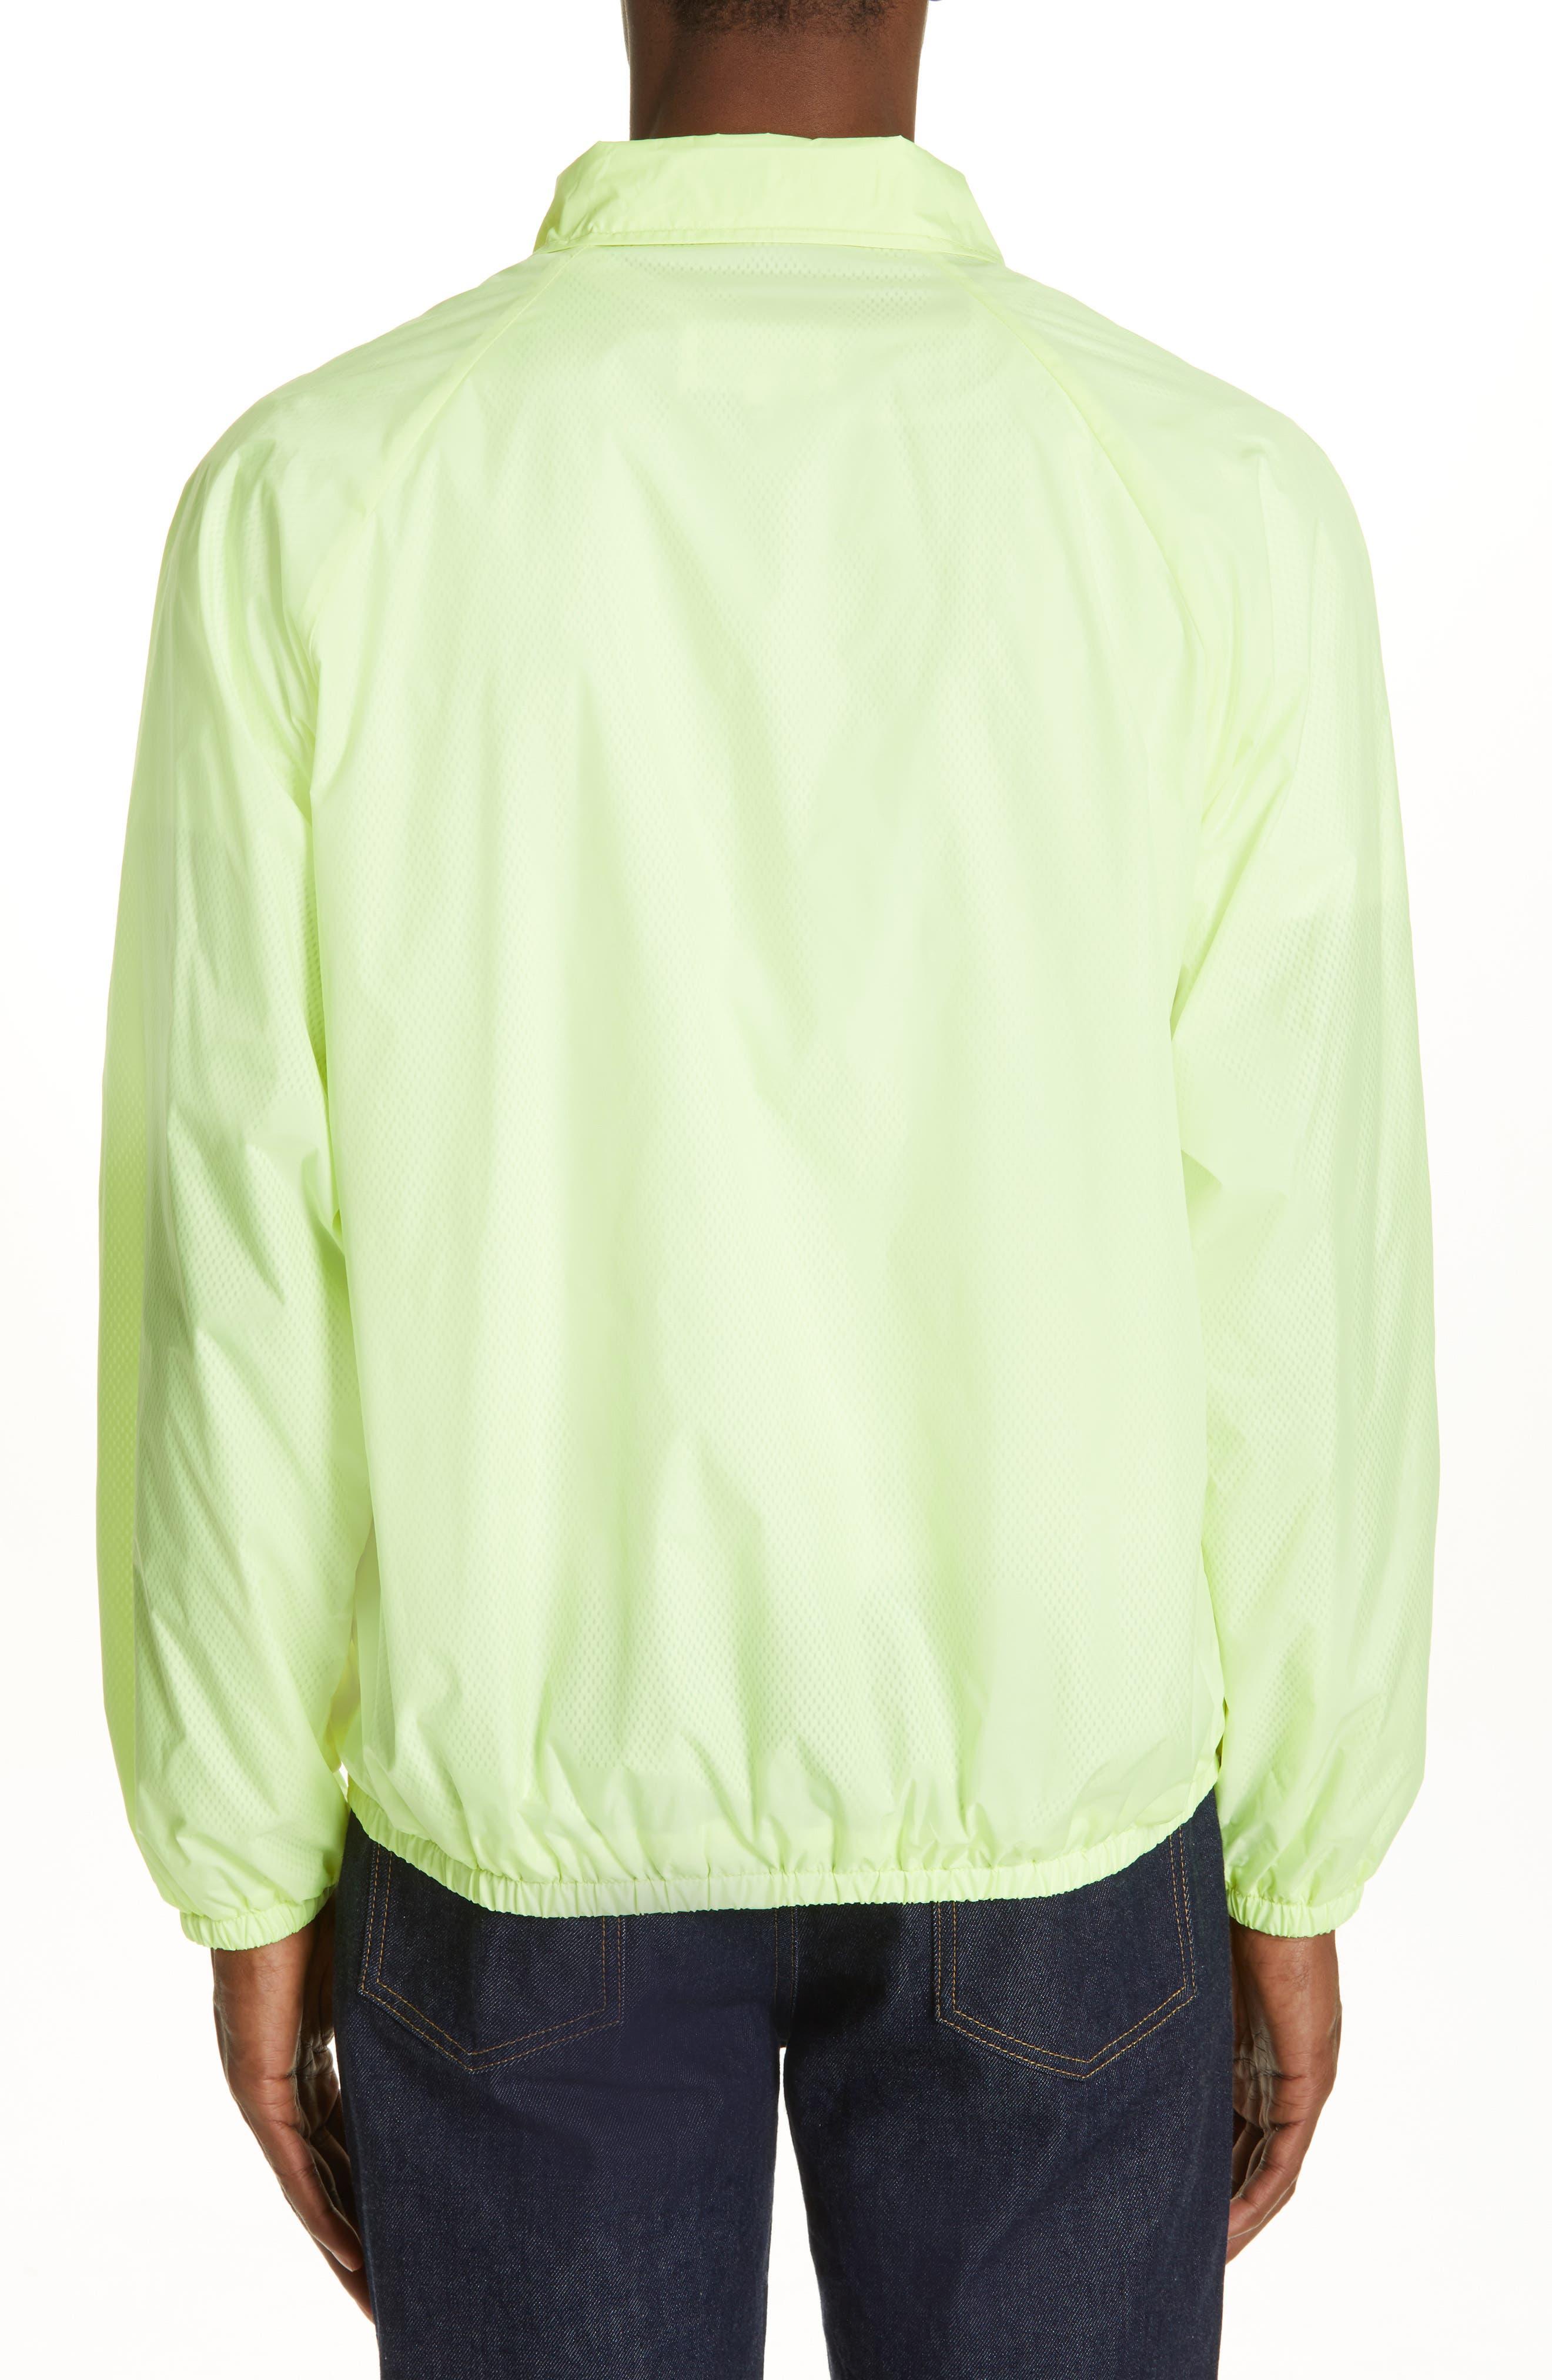 MAISON MARGIELA, Stereotype Coach's Jacket, Alternate thumbnail 2, color, NEON YELLOW